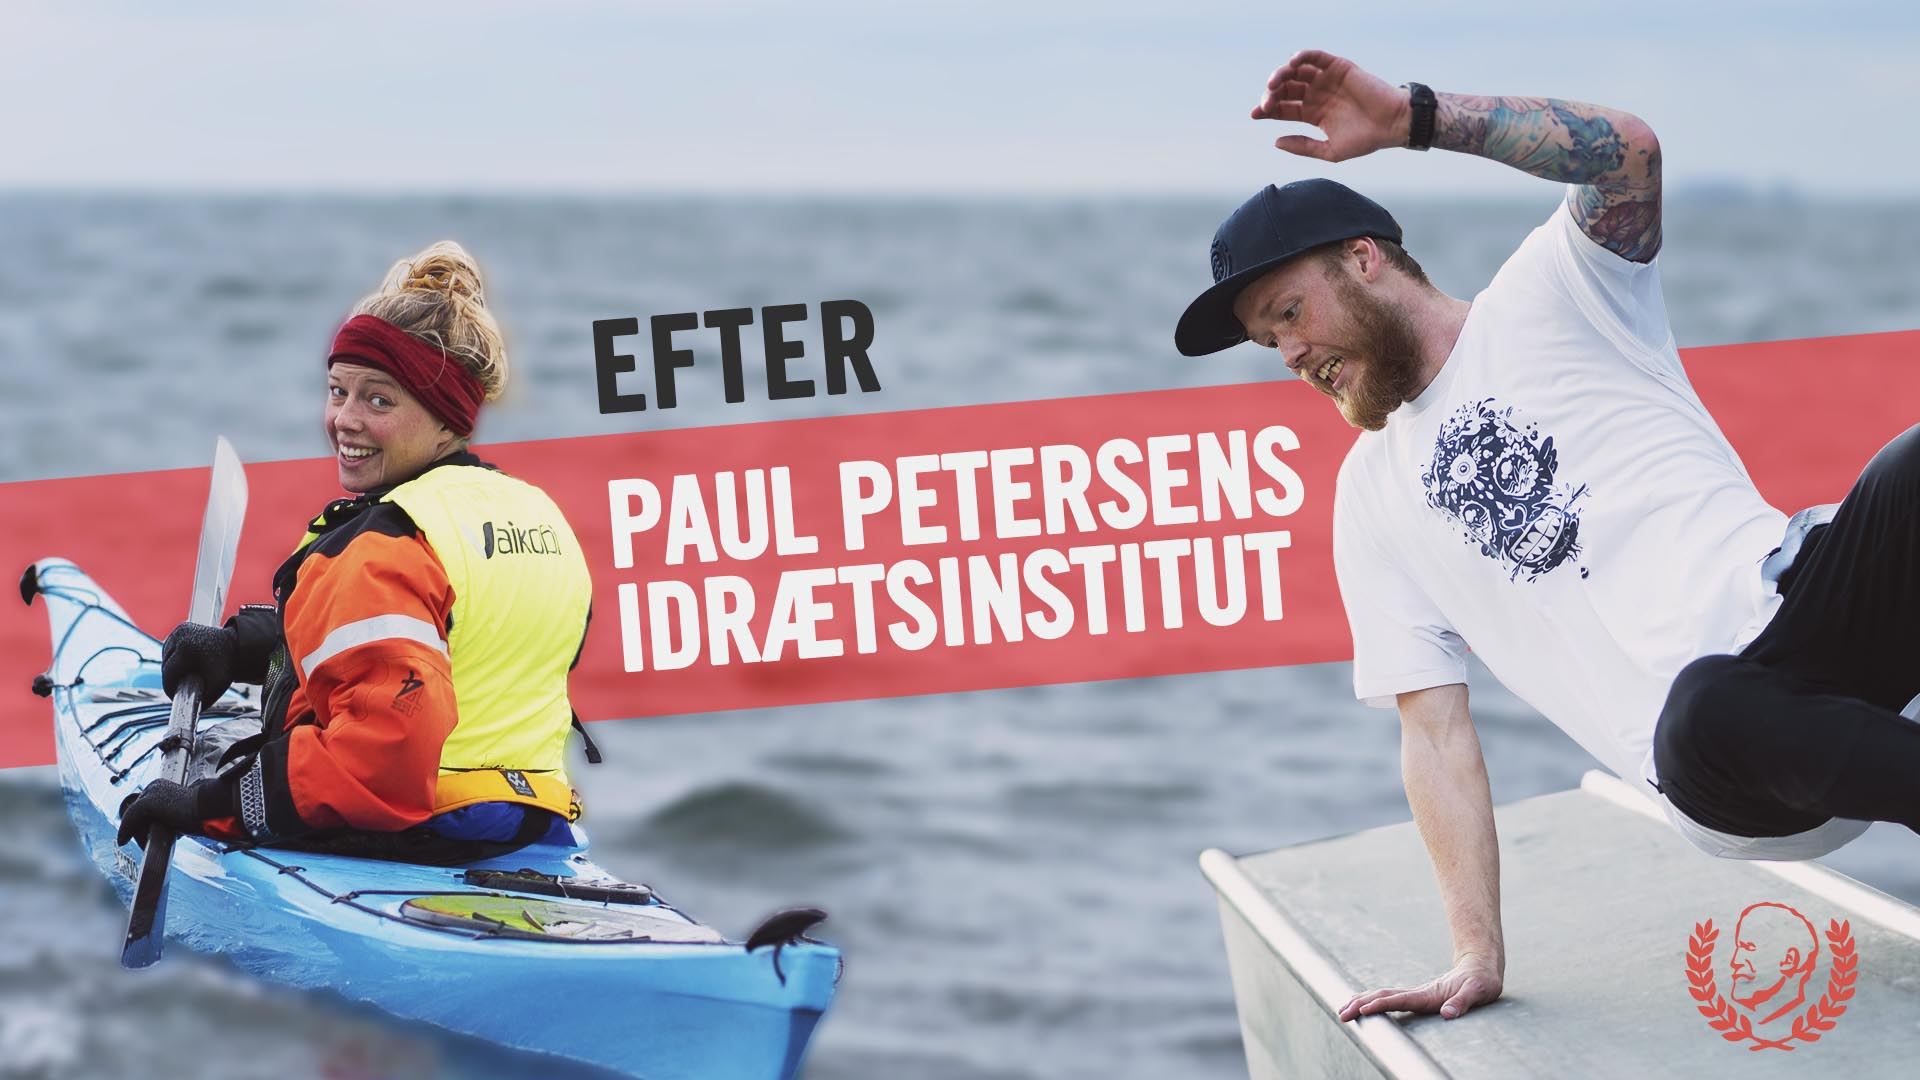 praesentationsvideo af Paul Petersens Idrætsinstitut